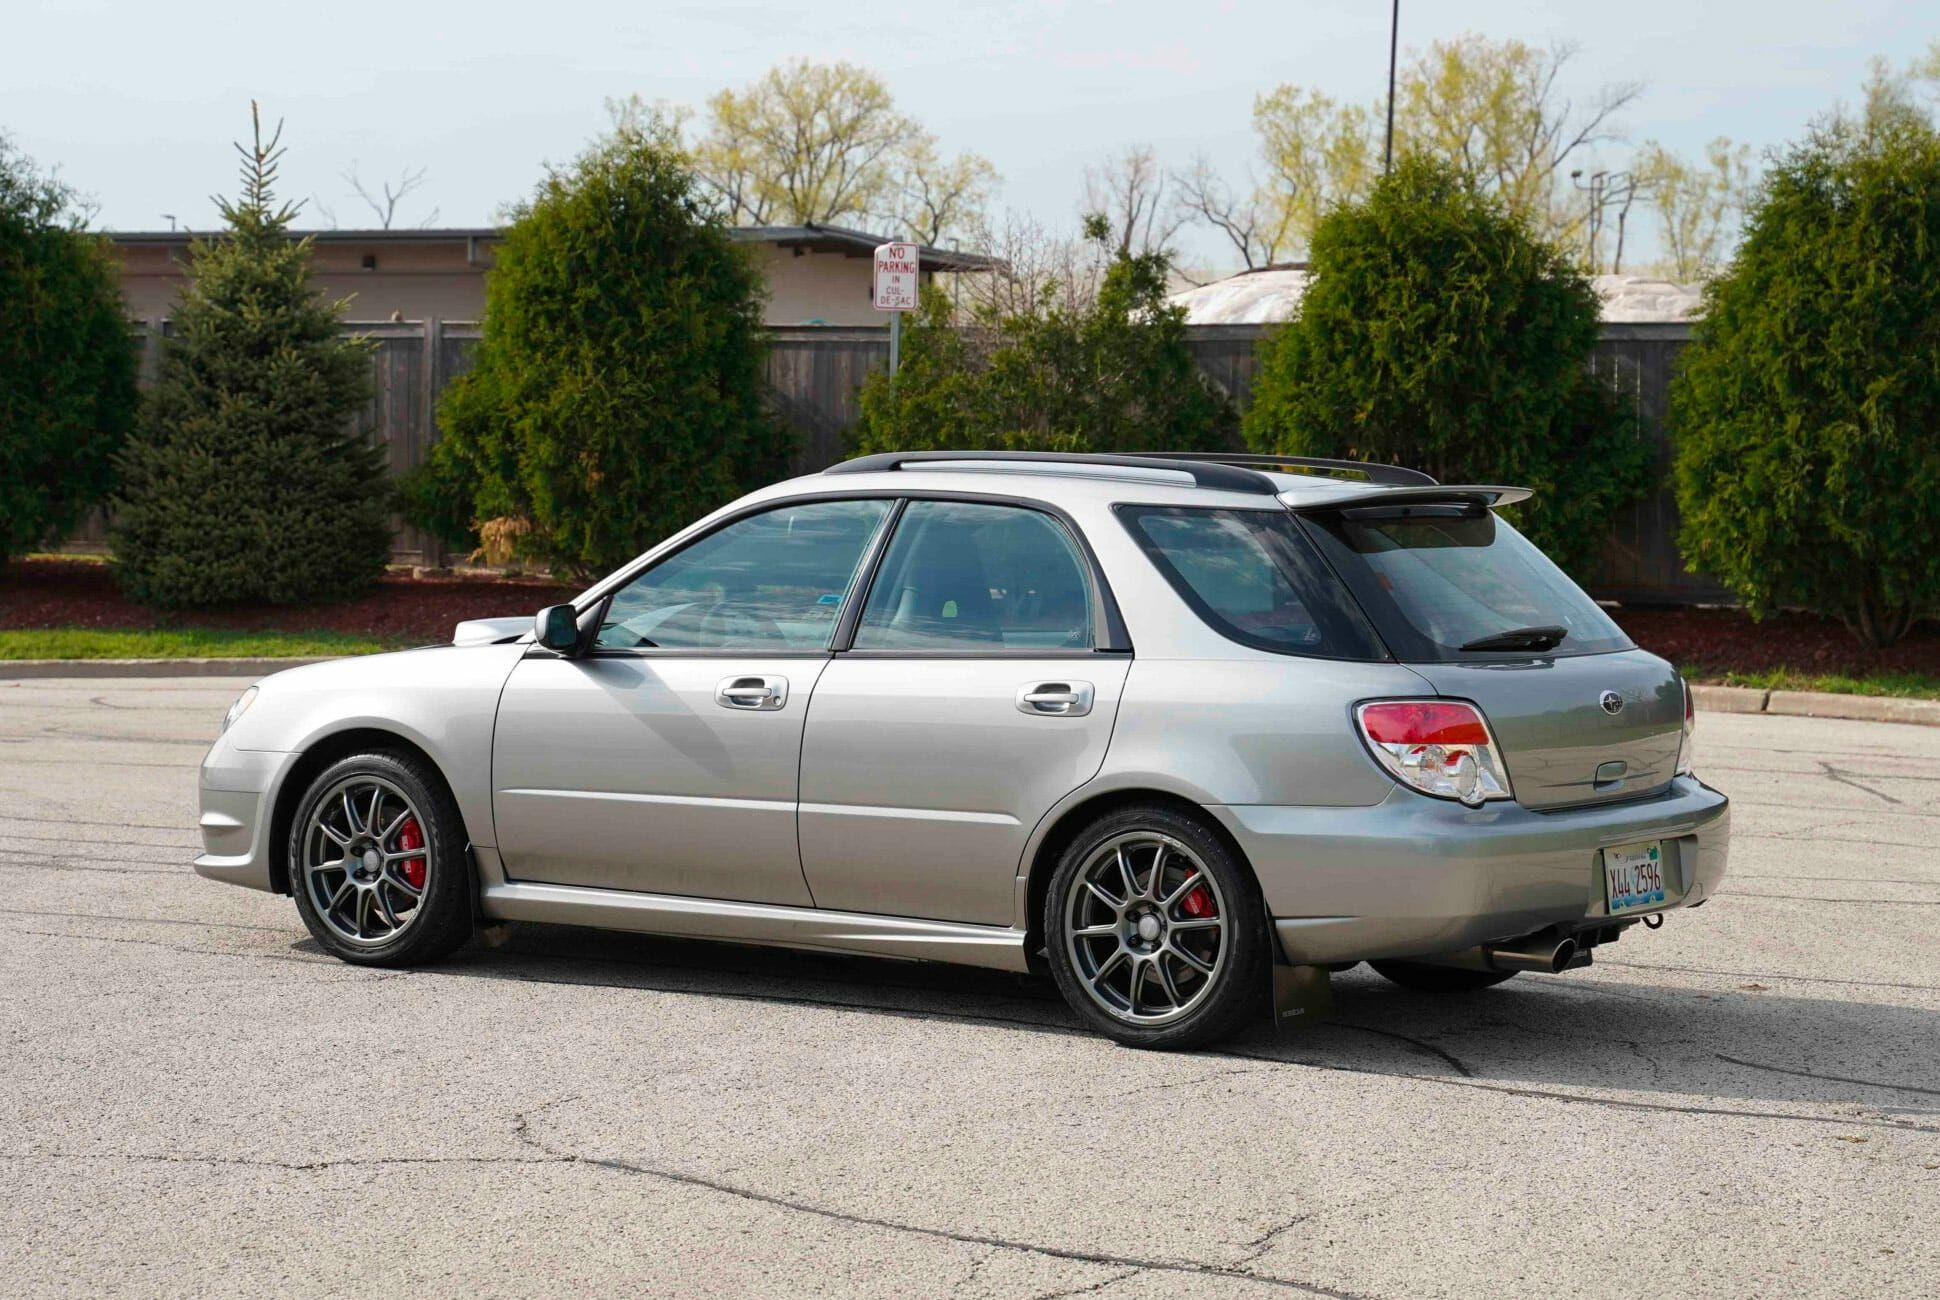 2007-Subaru-WRX-Wagon-14K-Miles-gear-patrol-slide-3